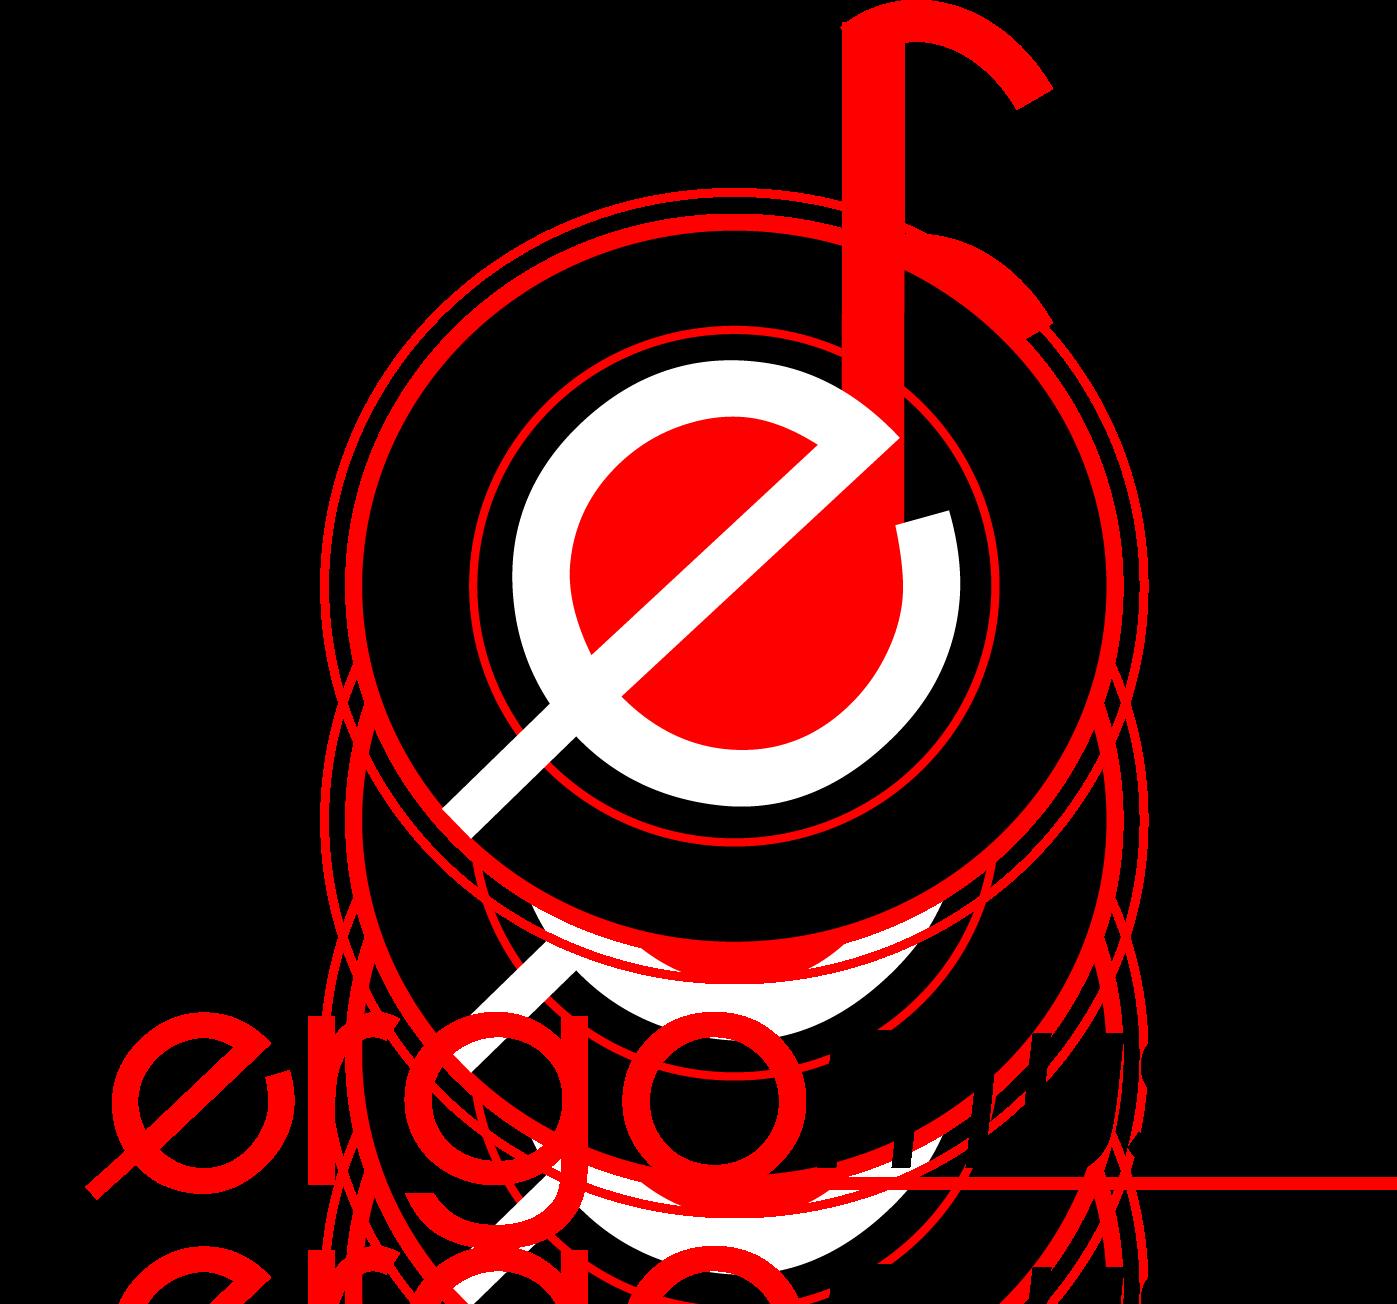 Ergo Music